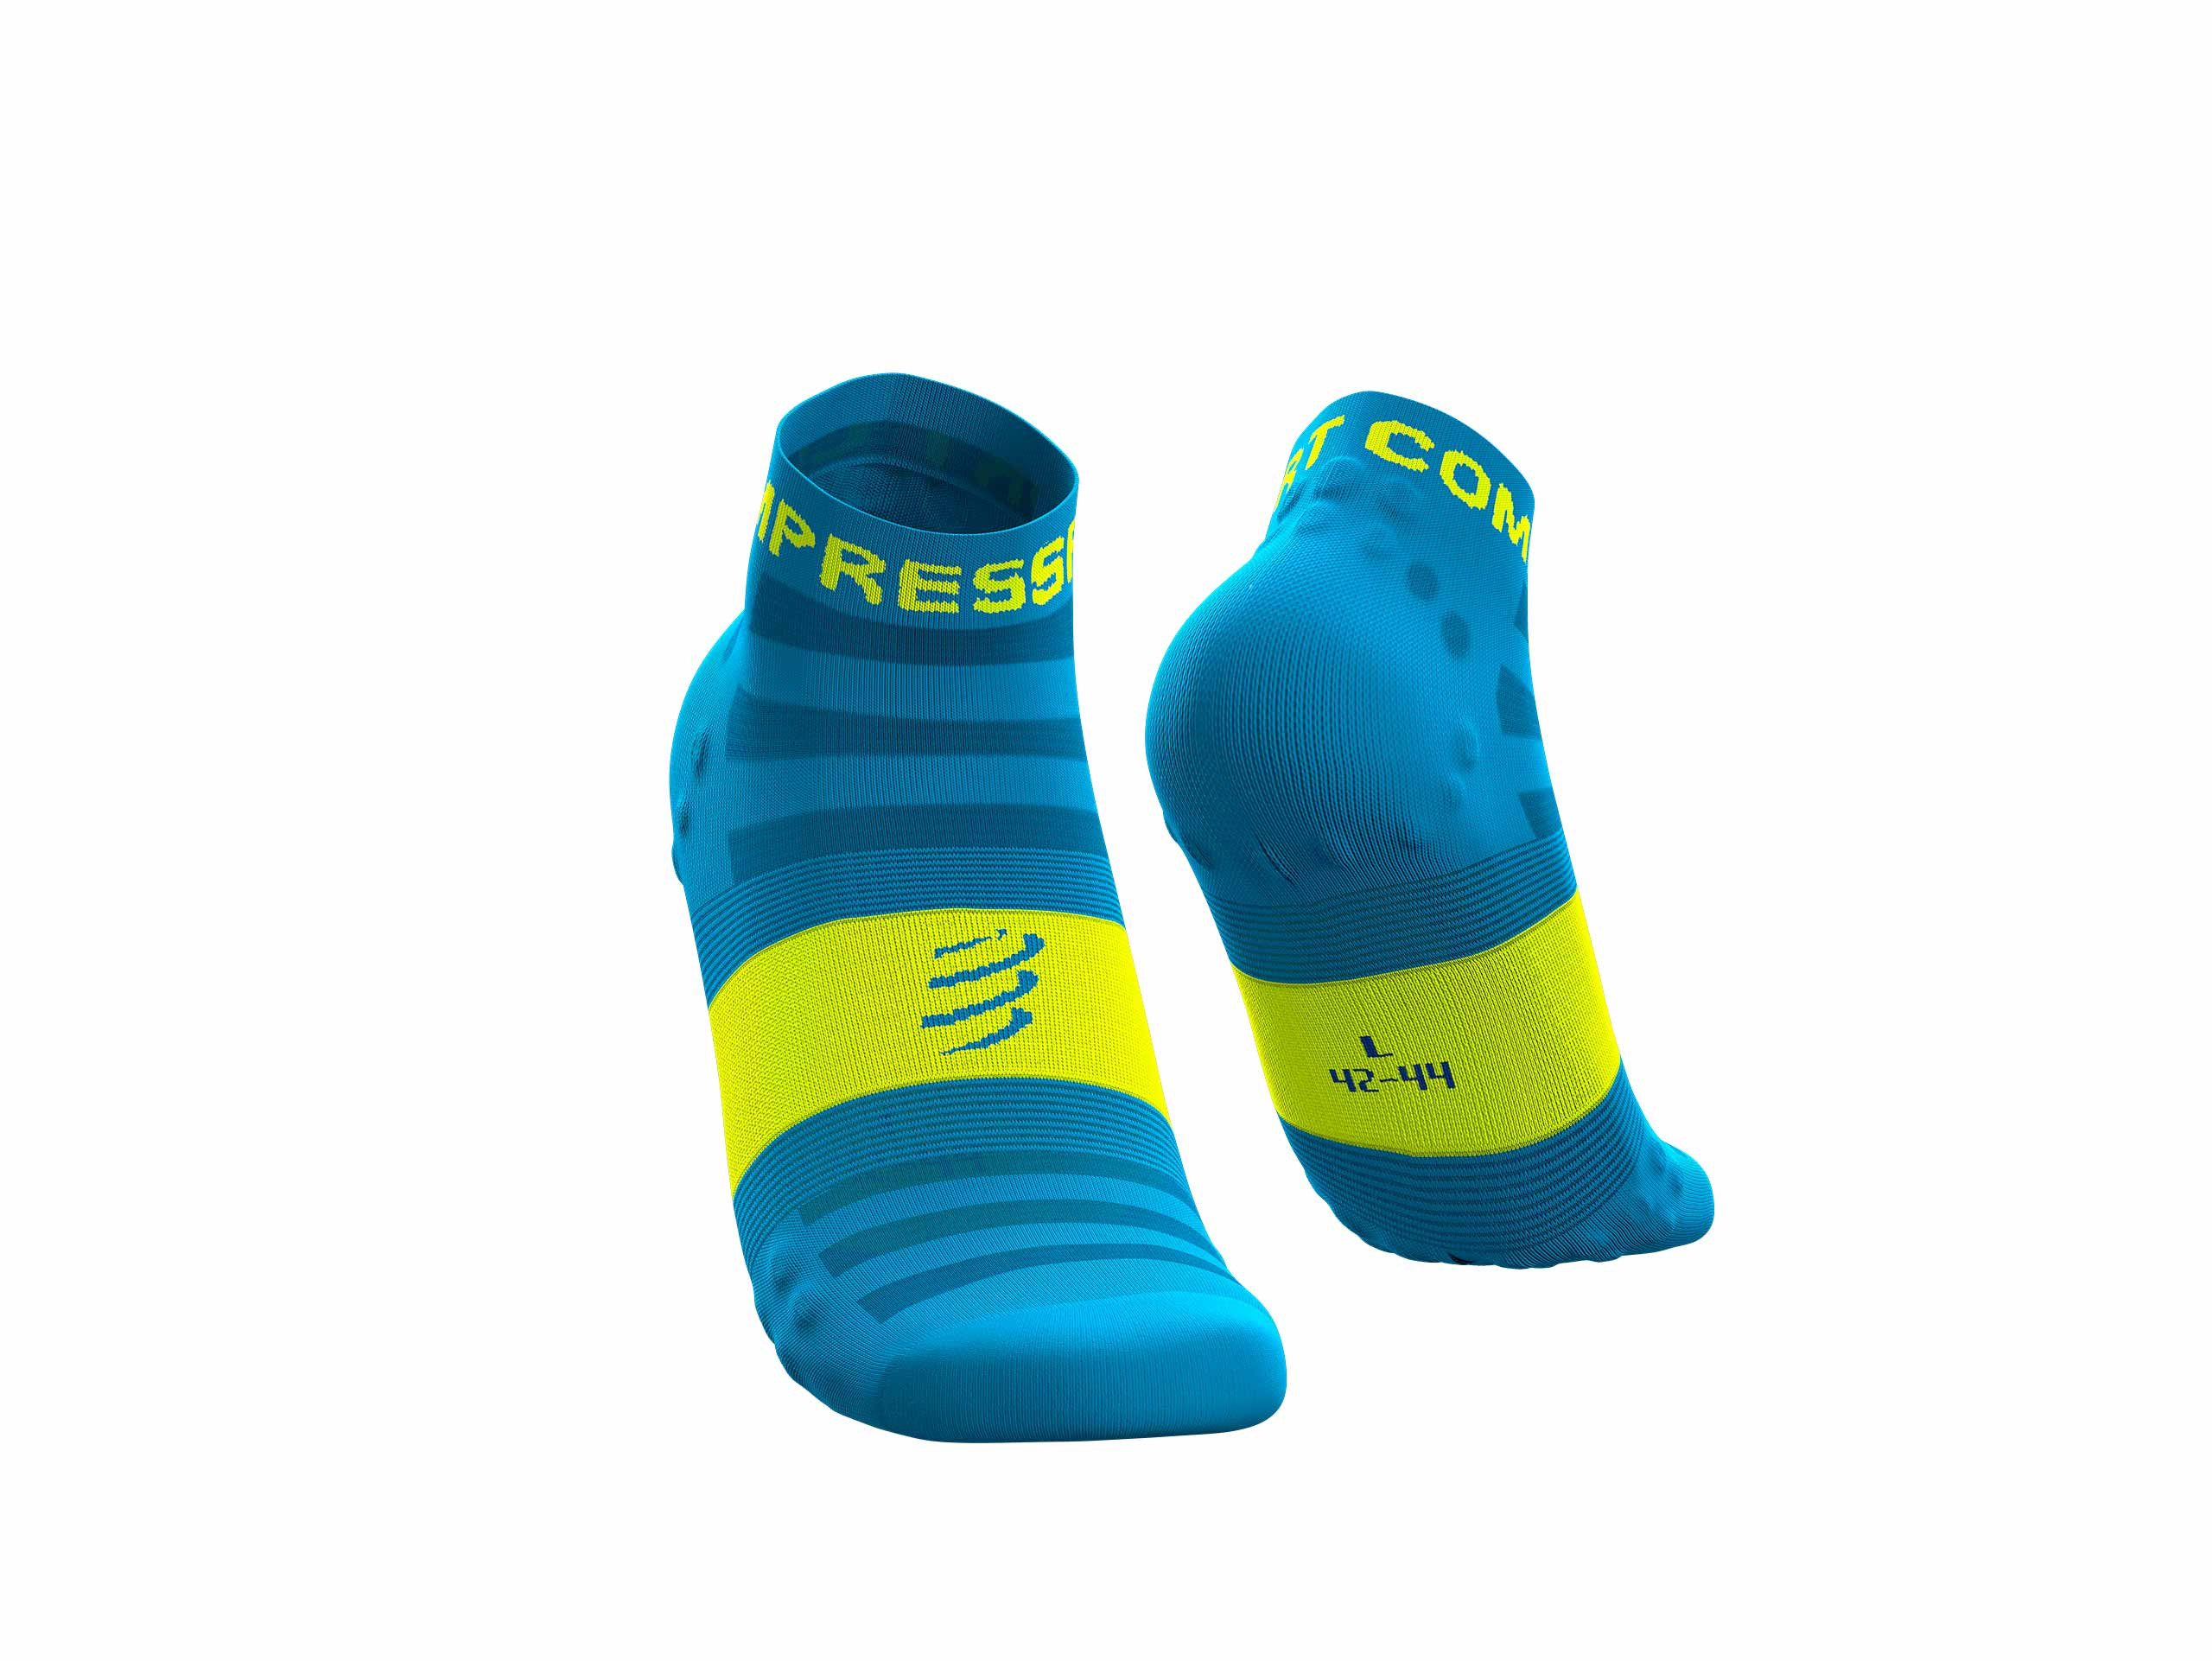 Pro Racing Socks v3.0 Ultralight Run Low neonblau